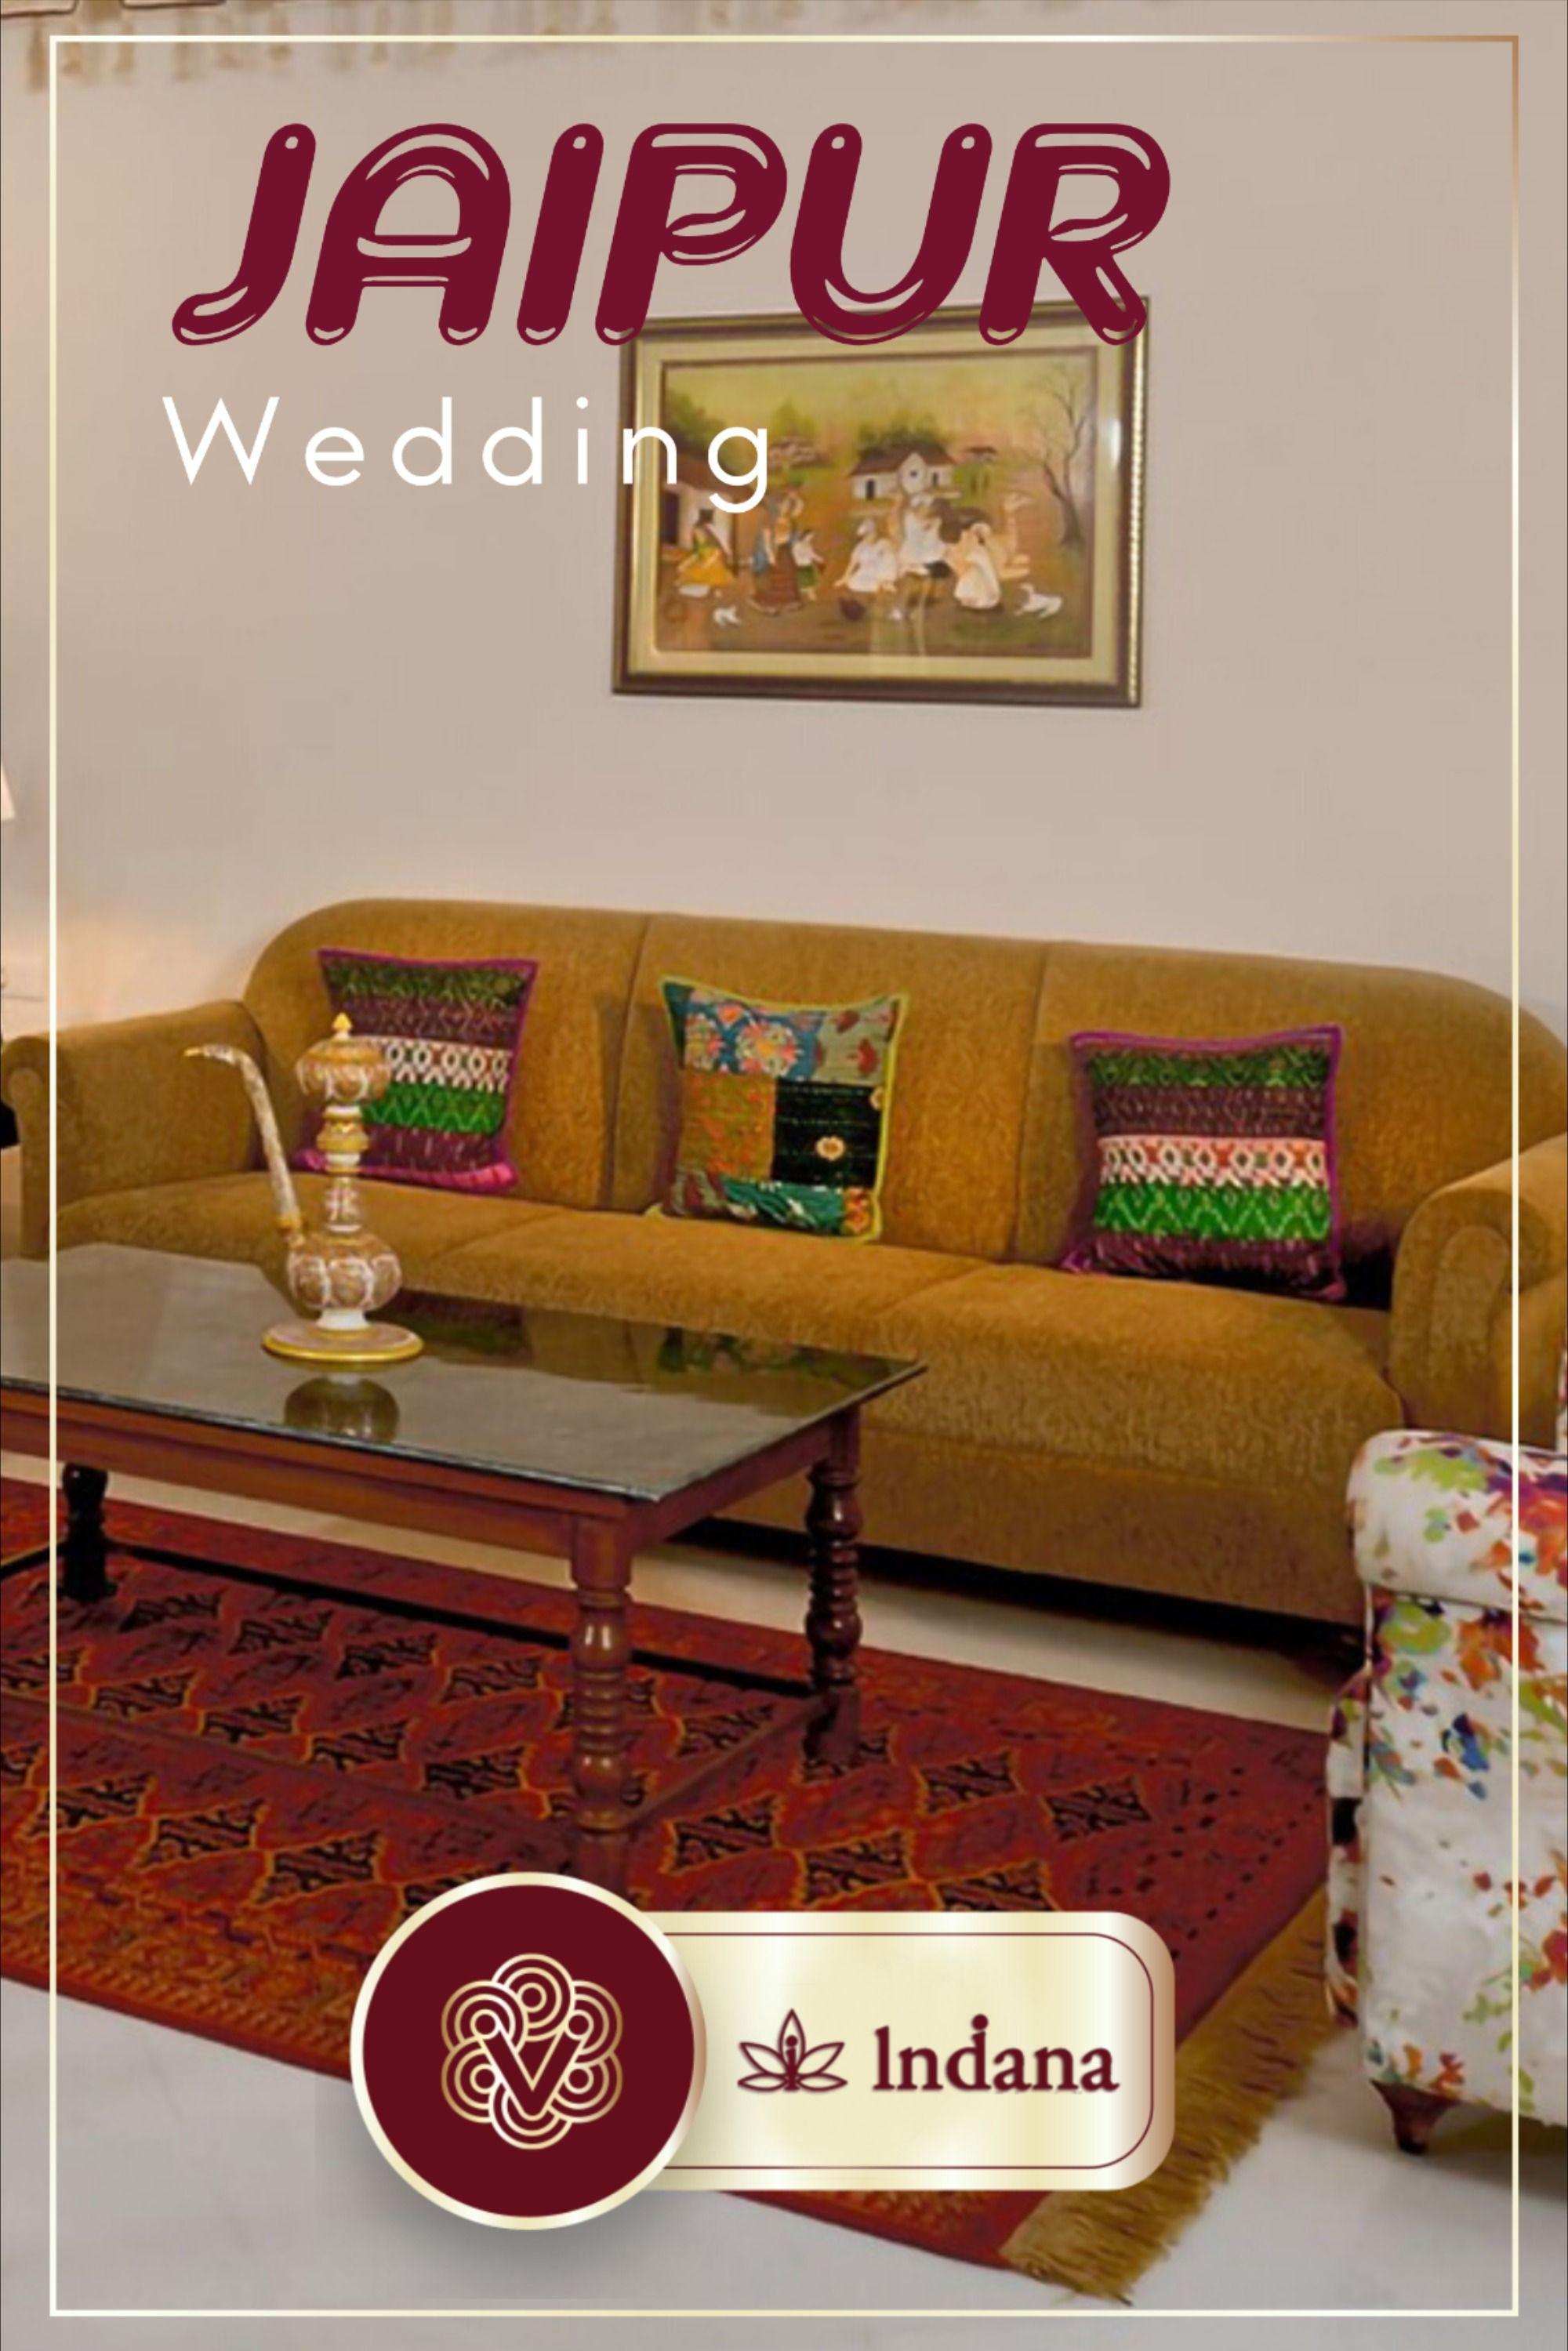 Indana Palace Jaipur Wedding Hotel In 2020 Wedding Company Hotel Wedding Star Wedding